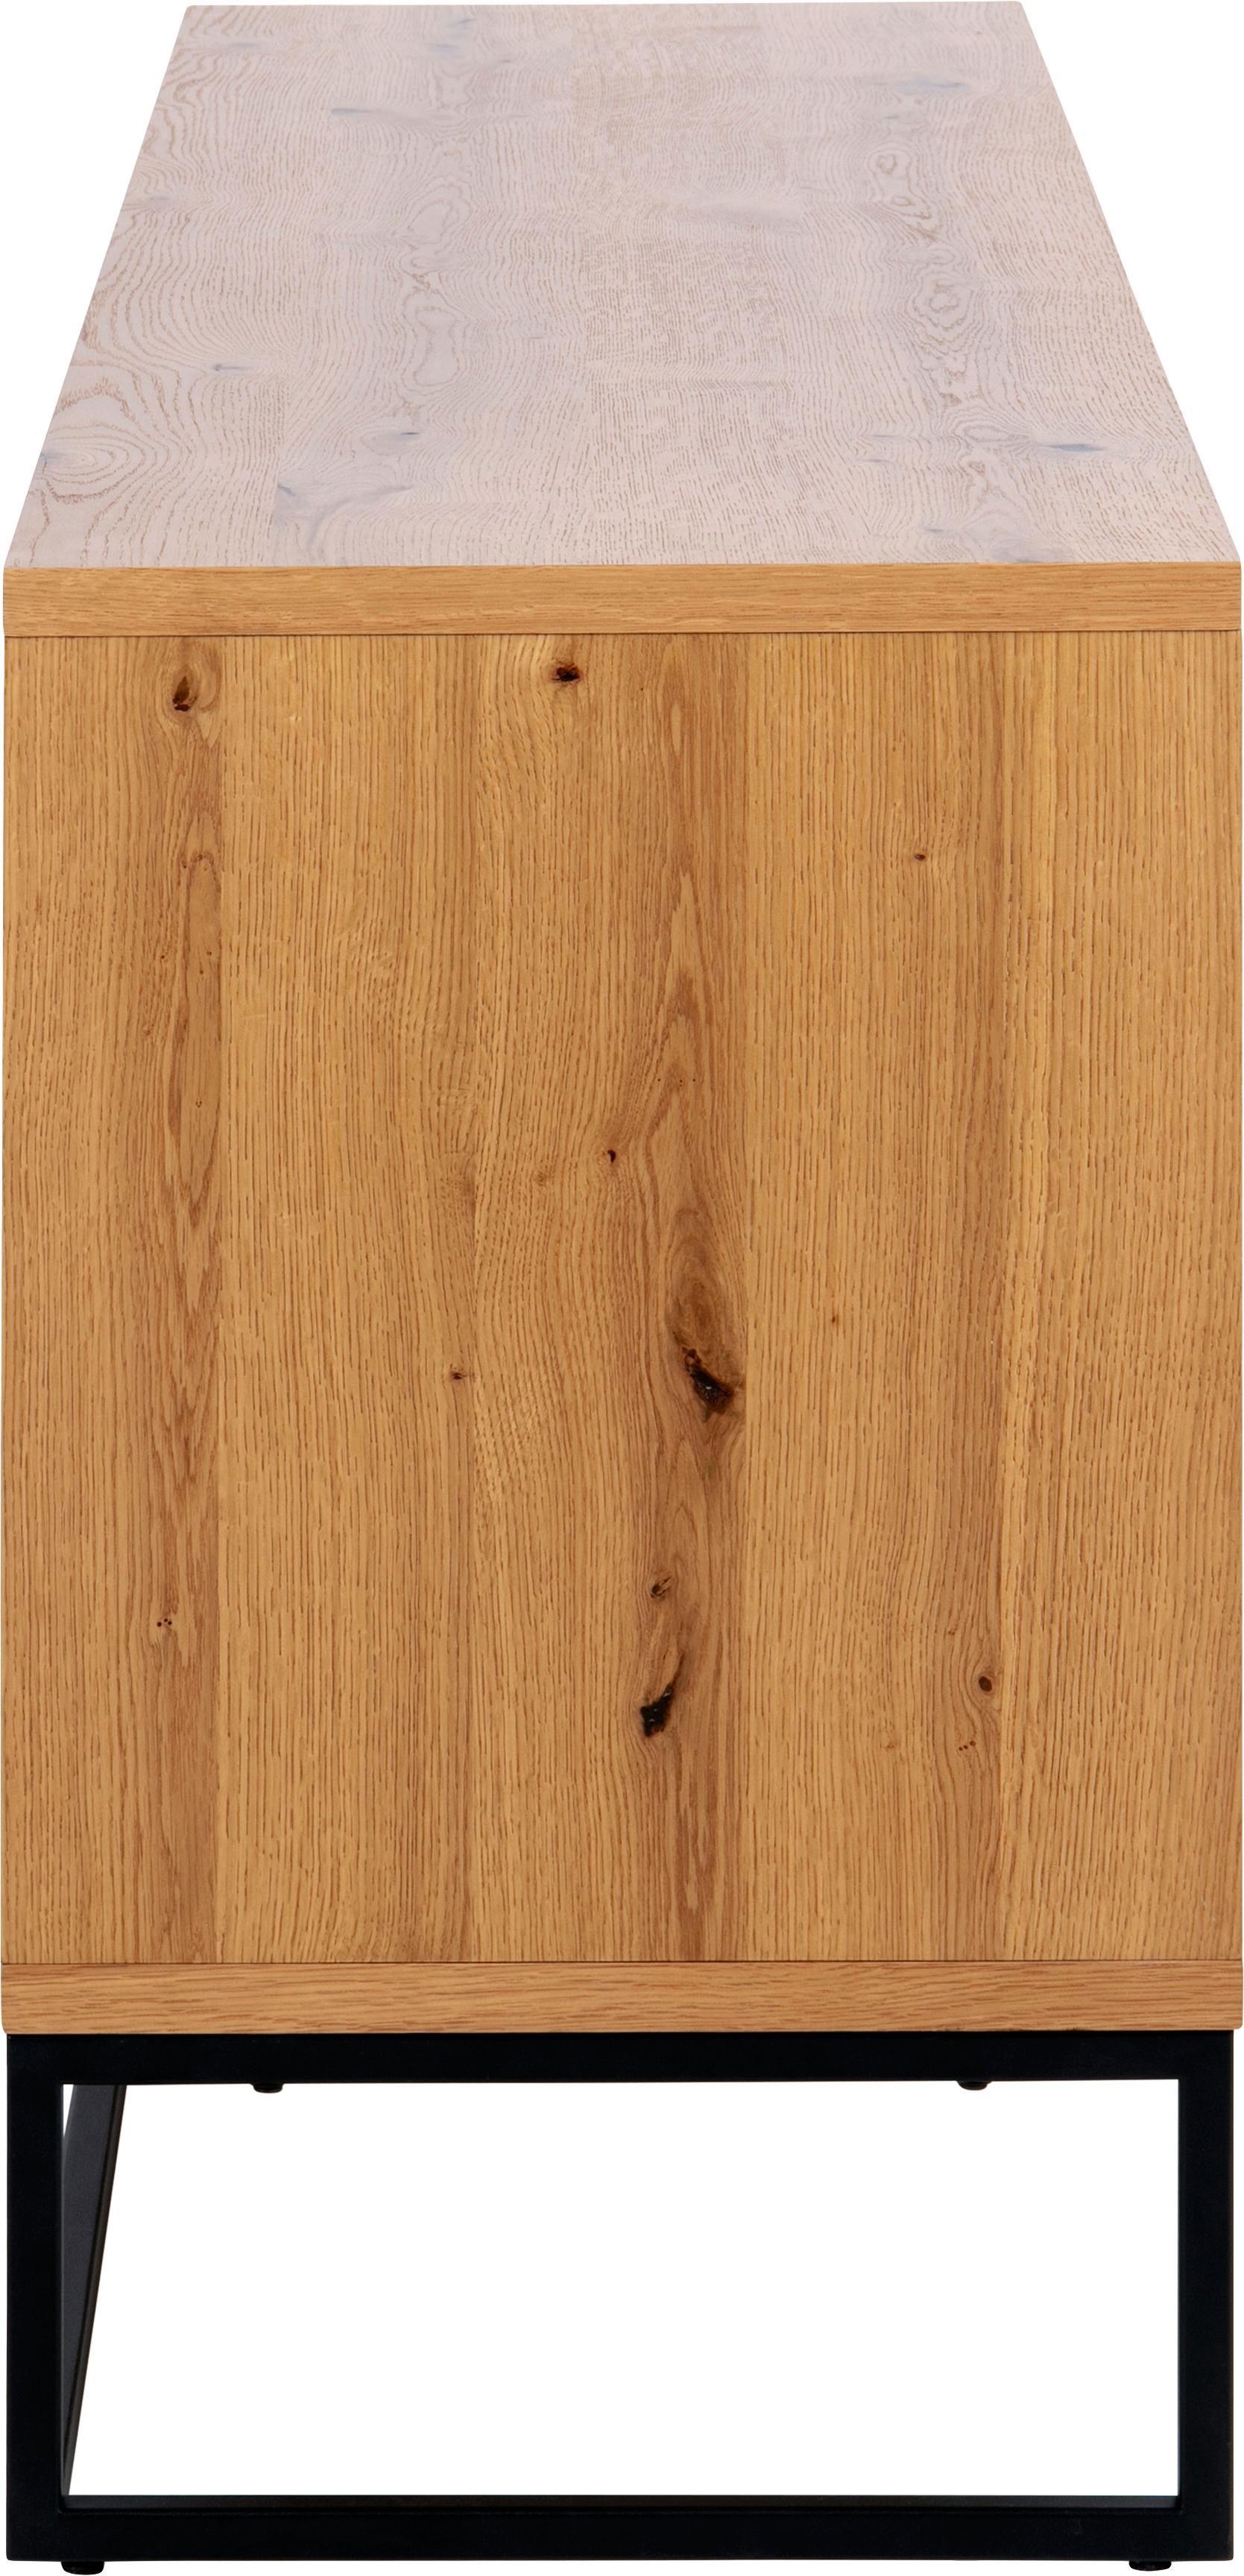 Skříňka s dubovou dýhou Dalarna, Divoký dub, černá